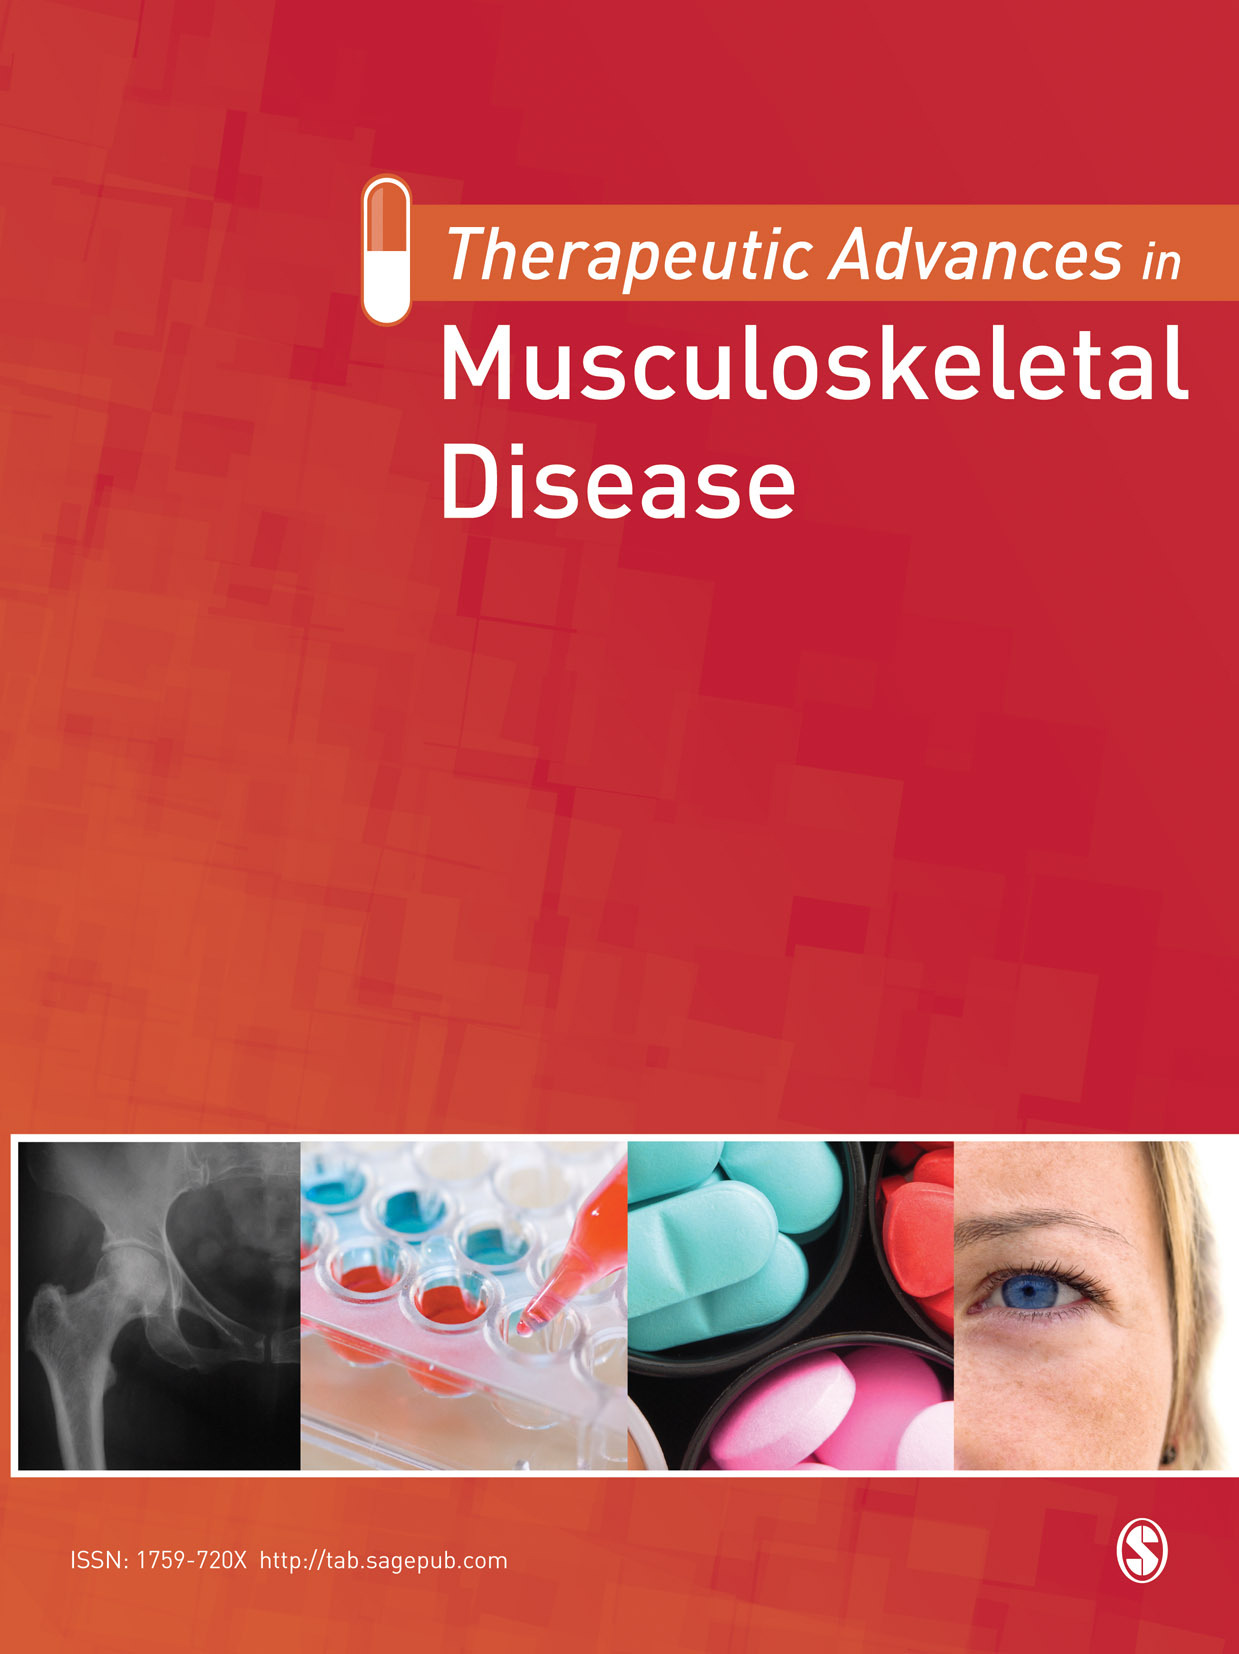 Therapeutic Advances in Musculoskeletal Disease